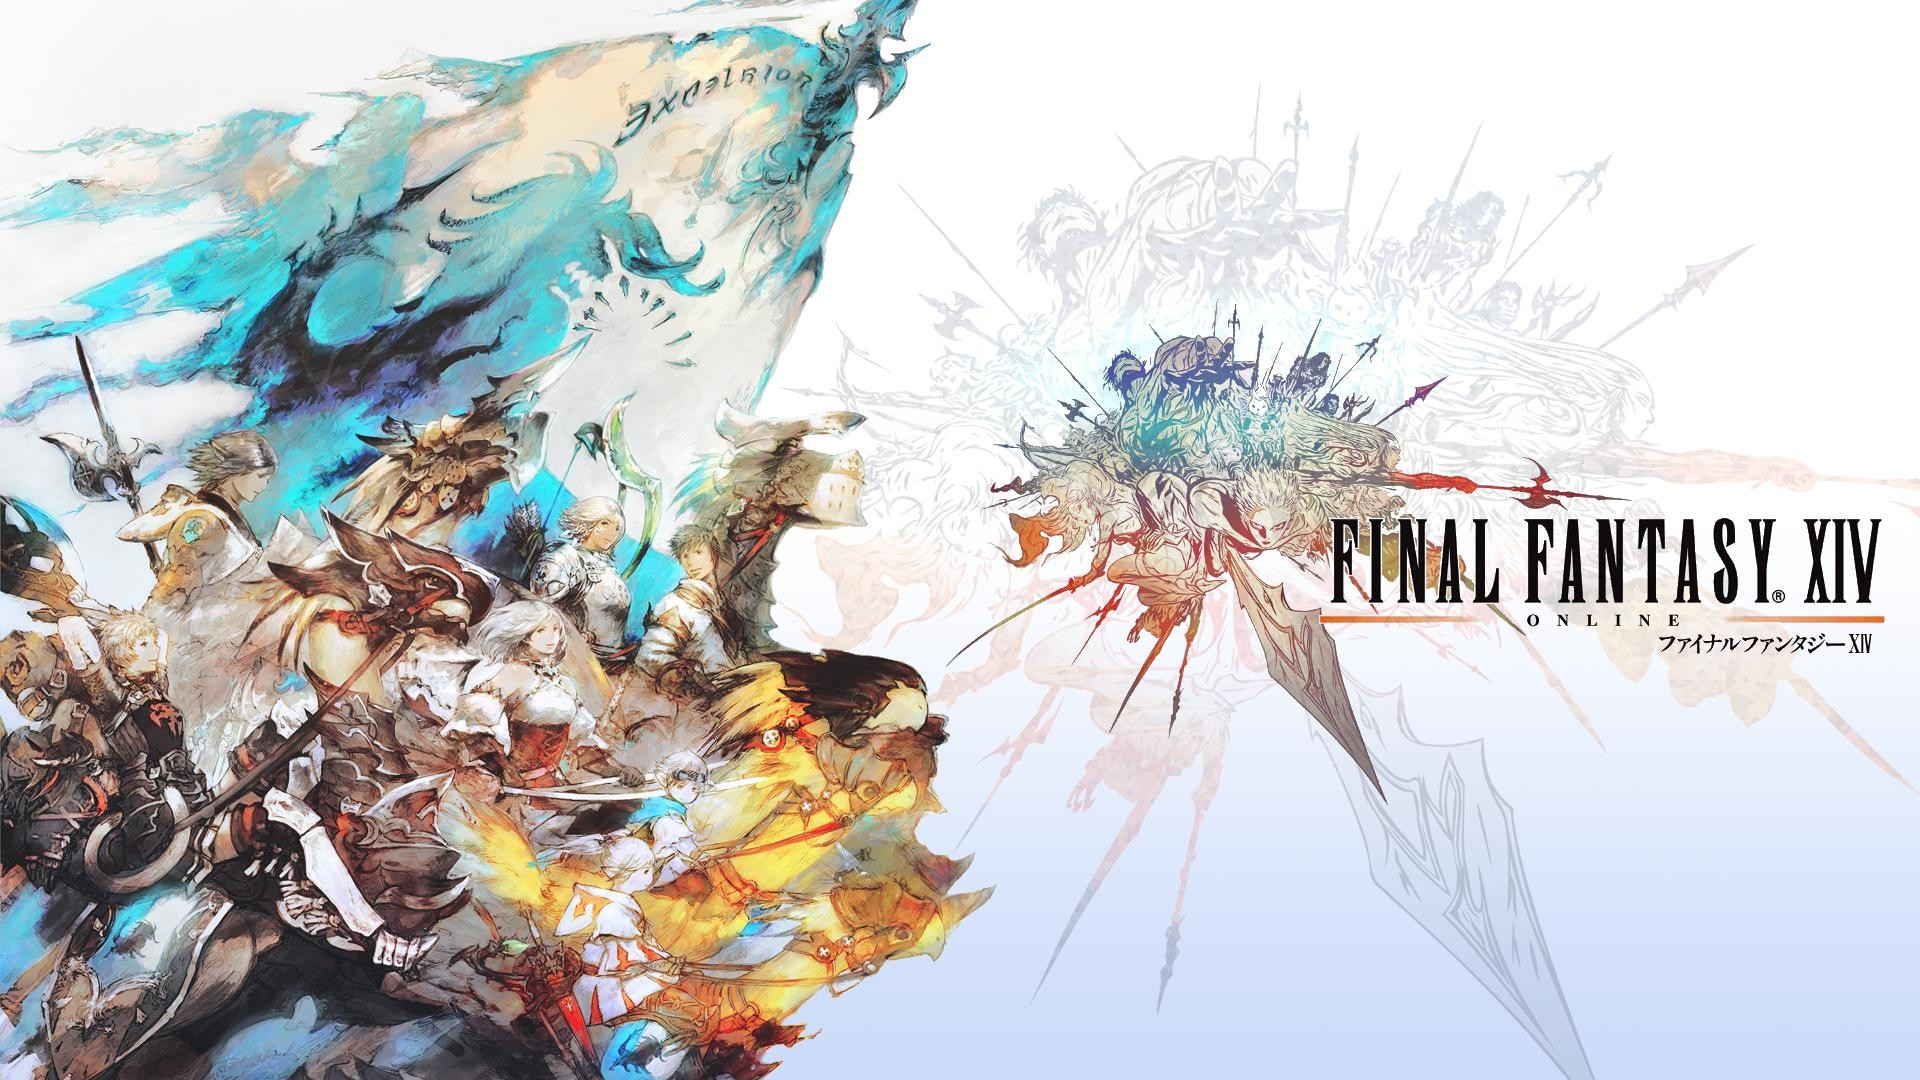 40 Hd Fantasy Ipad Wallpapers: Final Fantasy XIV Wallpaper ·① Download Free Amazing Full